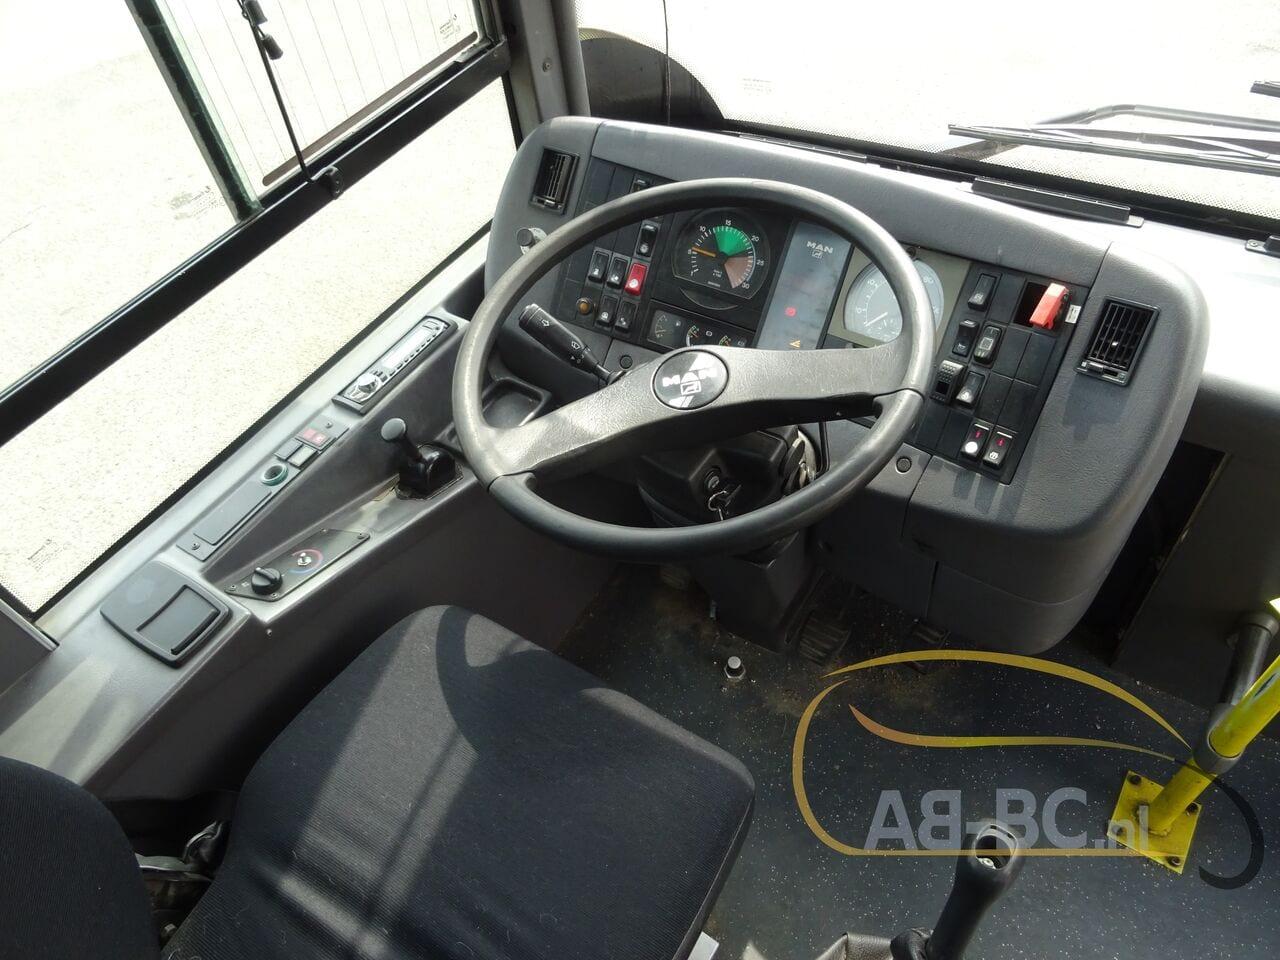 interurban-busMAN-Fast-64-seats---1619619943389534354_big_36581e4ff493b81cbcf5f8f718e88664--21042817163019598600